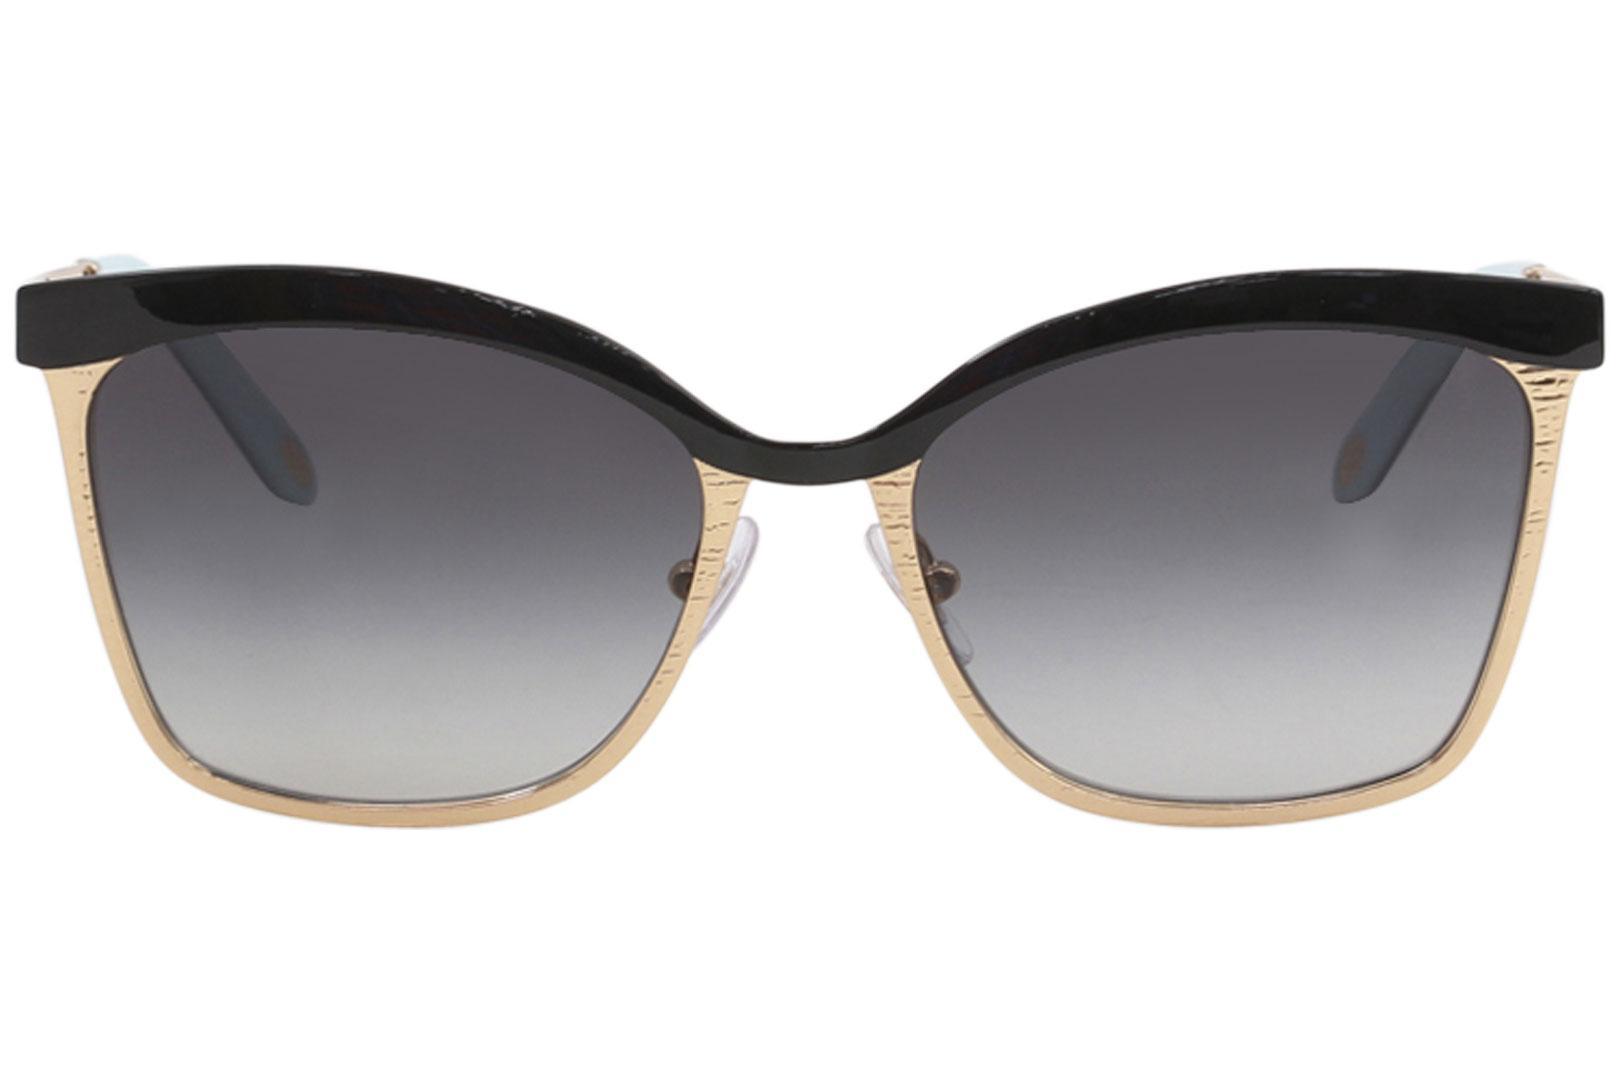 fd85e1ef17254 ... Women s TF3060 TF 3060 Fashion Square Sunglasses by Tiffany   Co. 12345